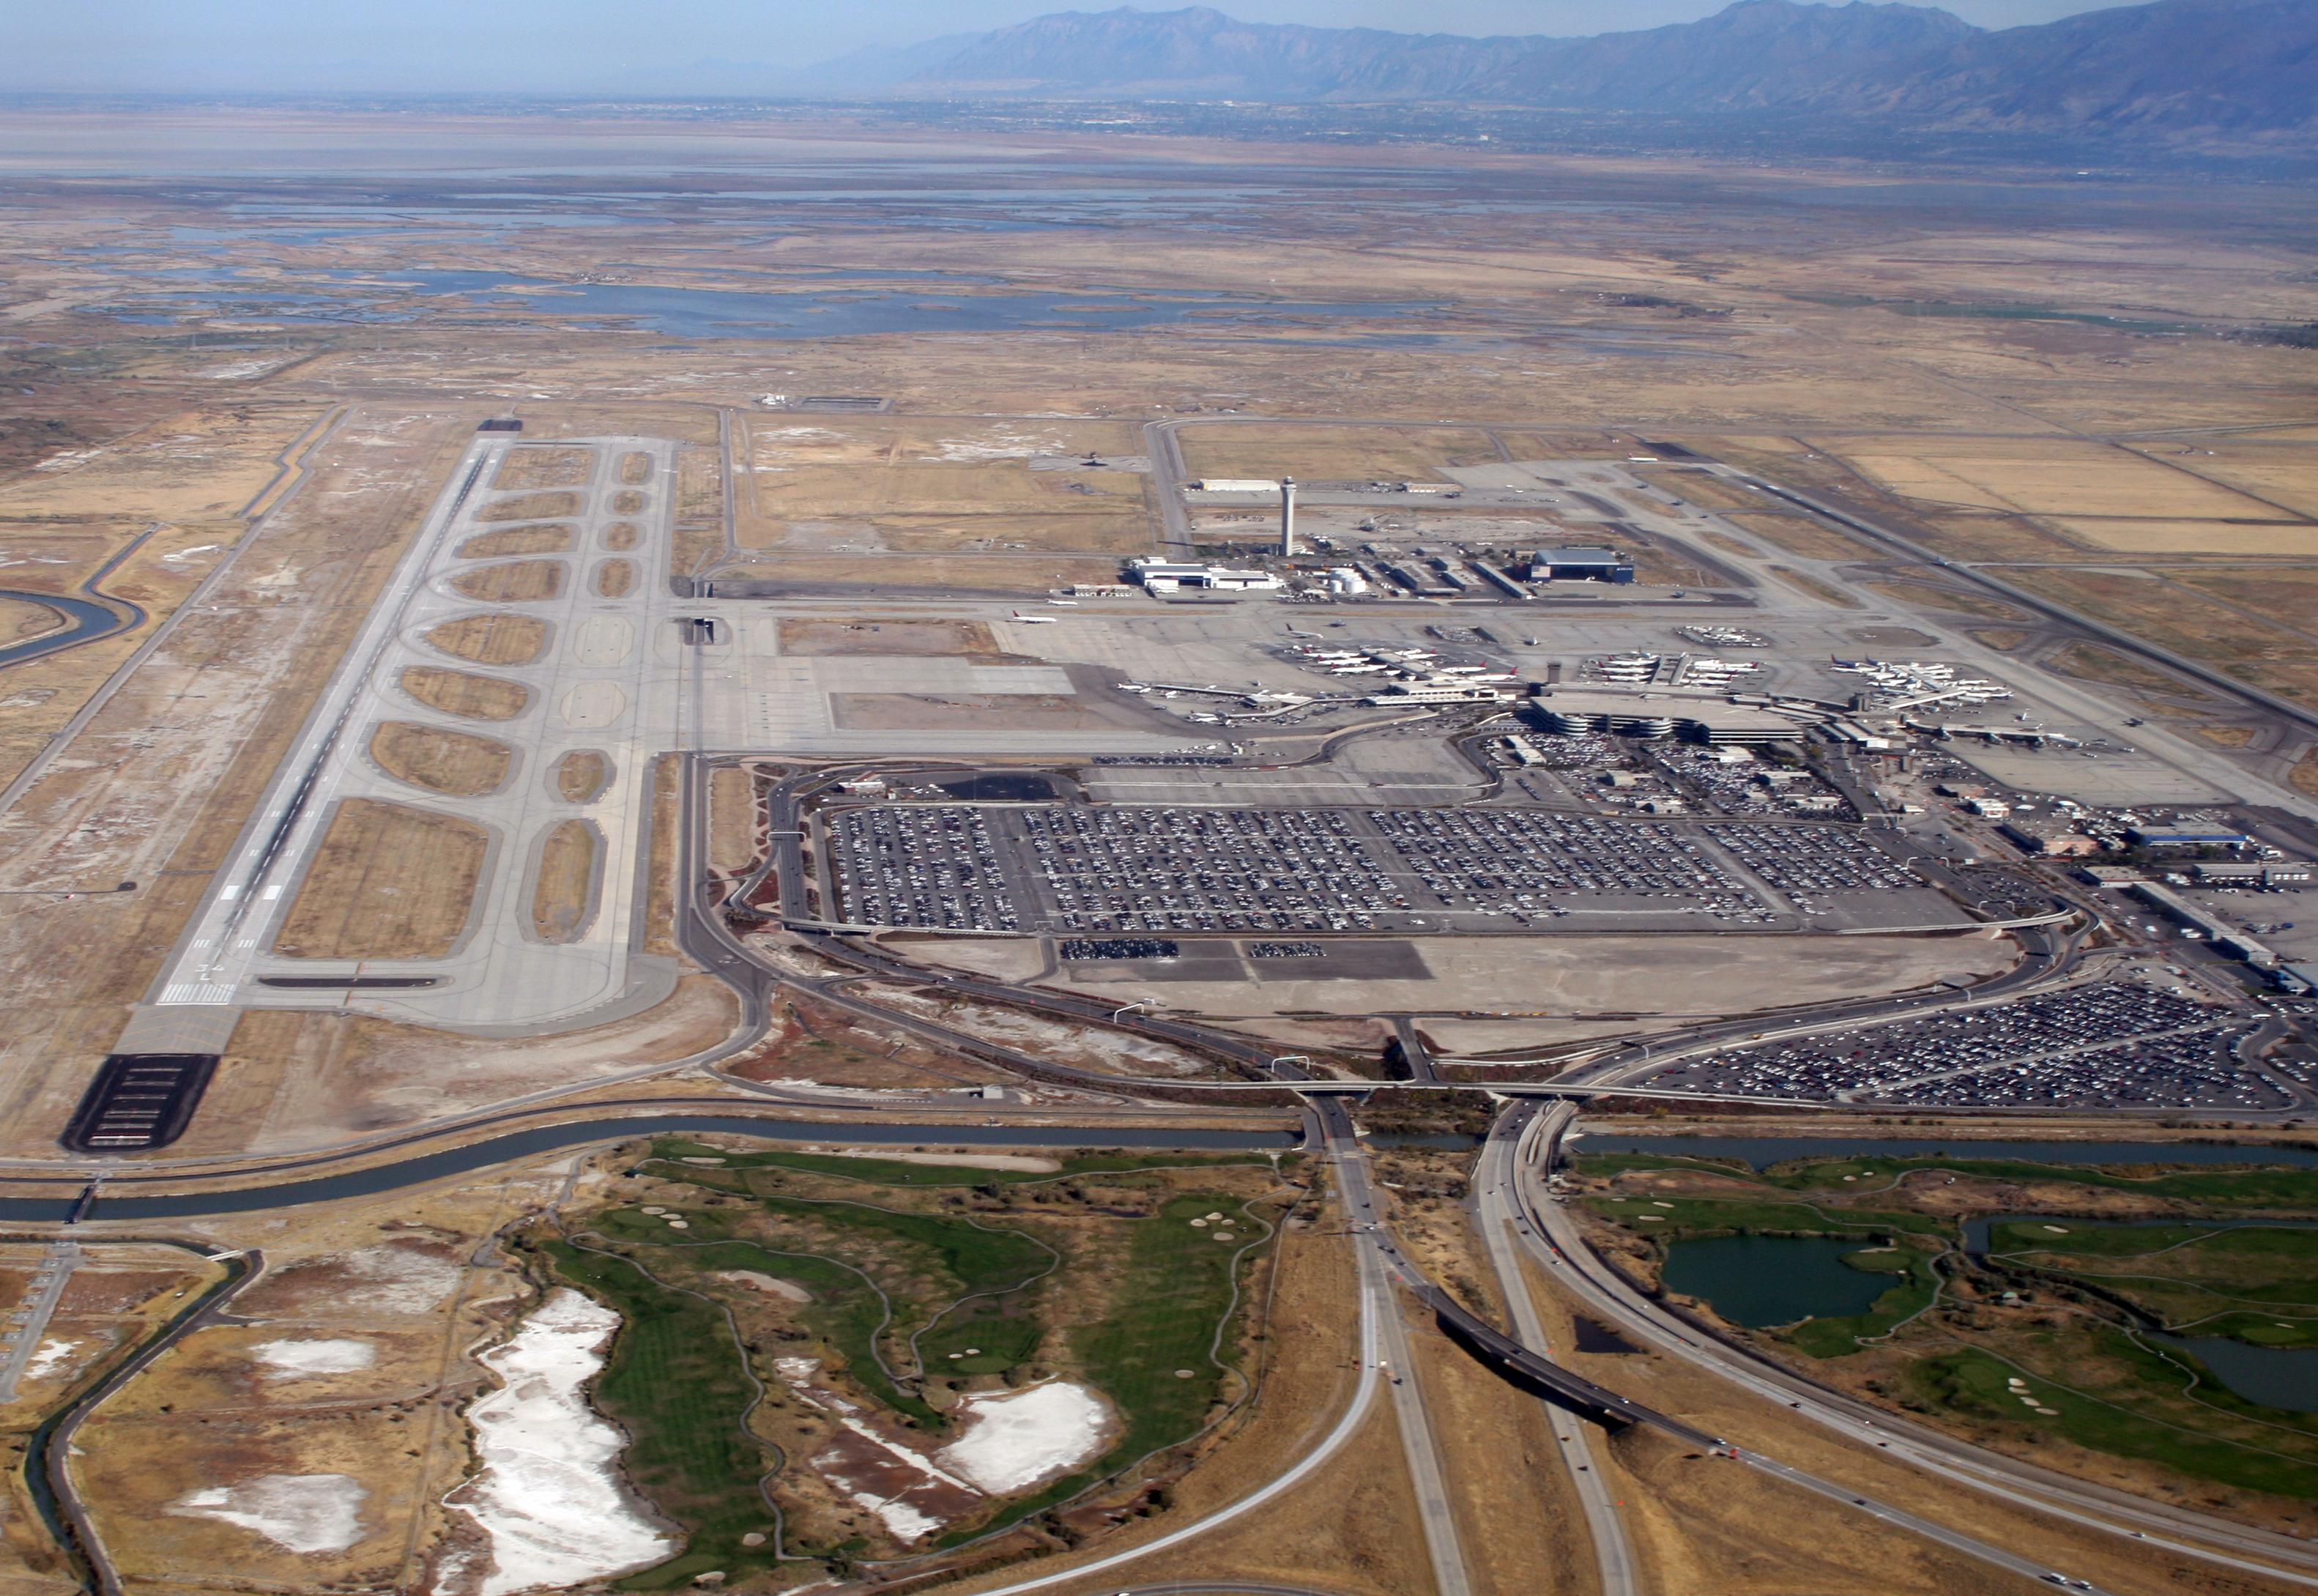 Depiction of Aeropuerto Internacional de Salt Lake City